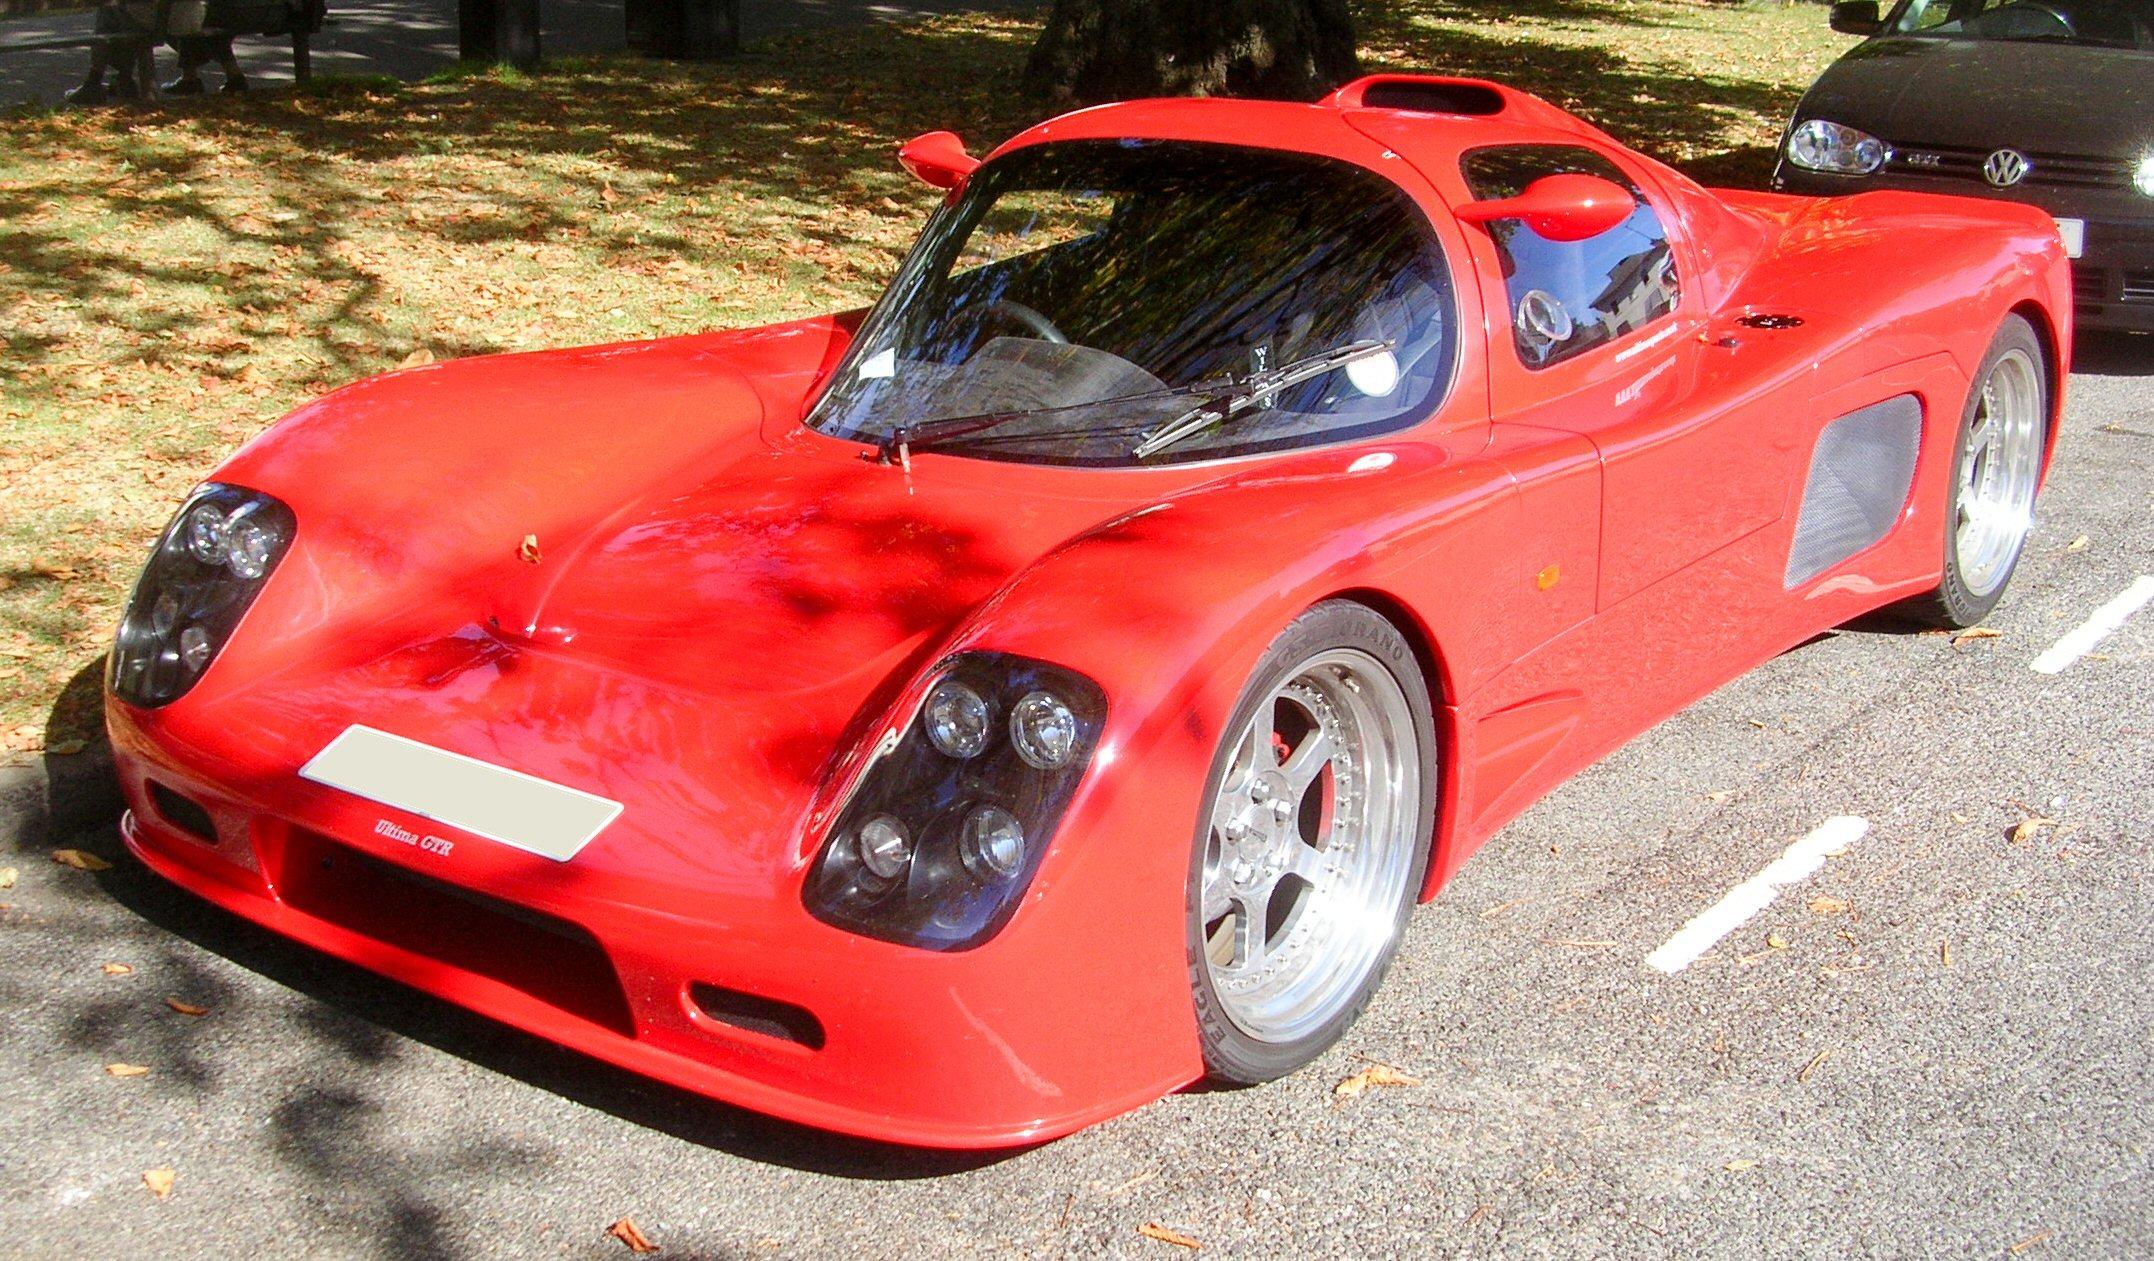 Ultima GTR 640 14 Supercar Records